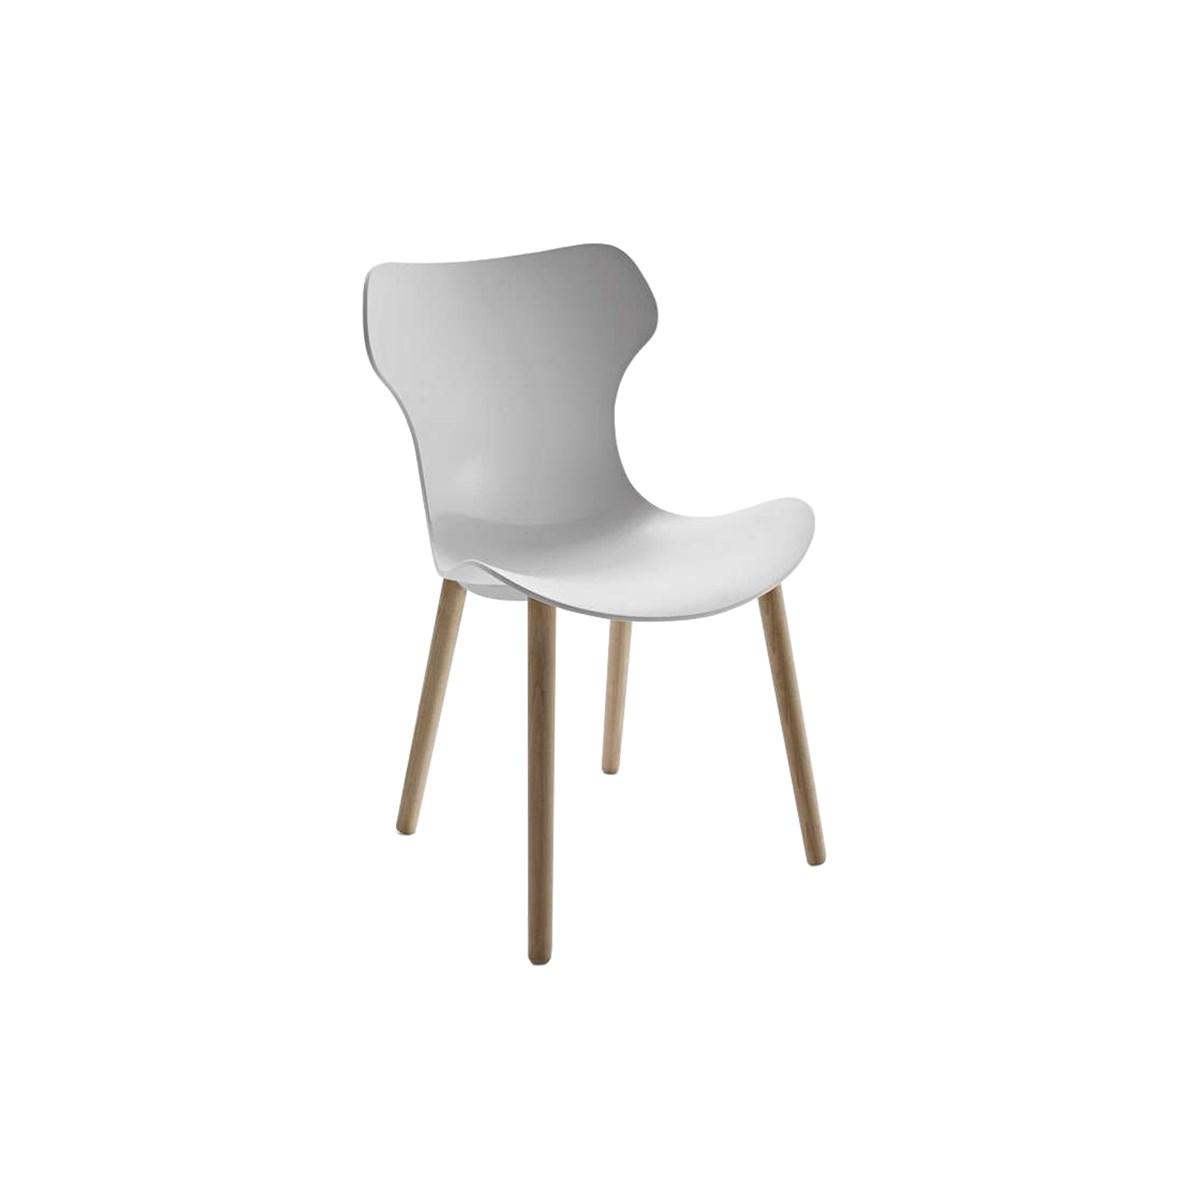 B&B-Italia-Naoto-Fukasawa-Papilio-Shell-Chair-Matisse-1 (1)